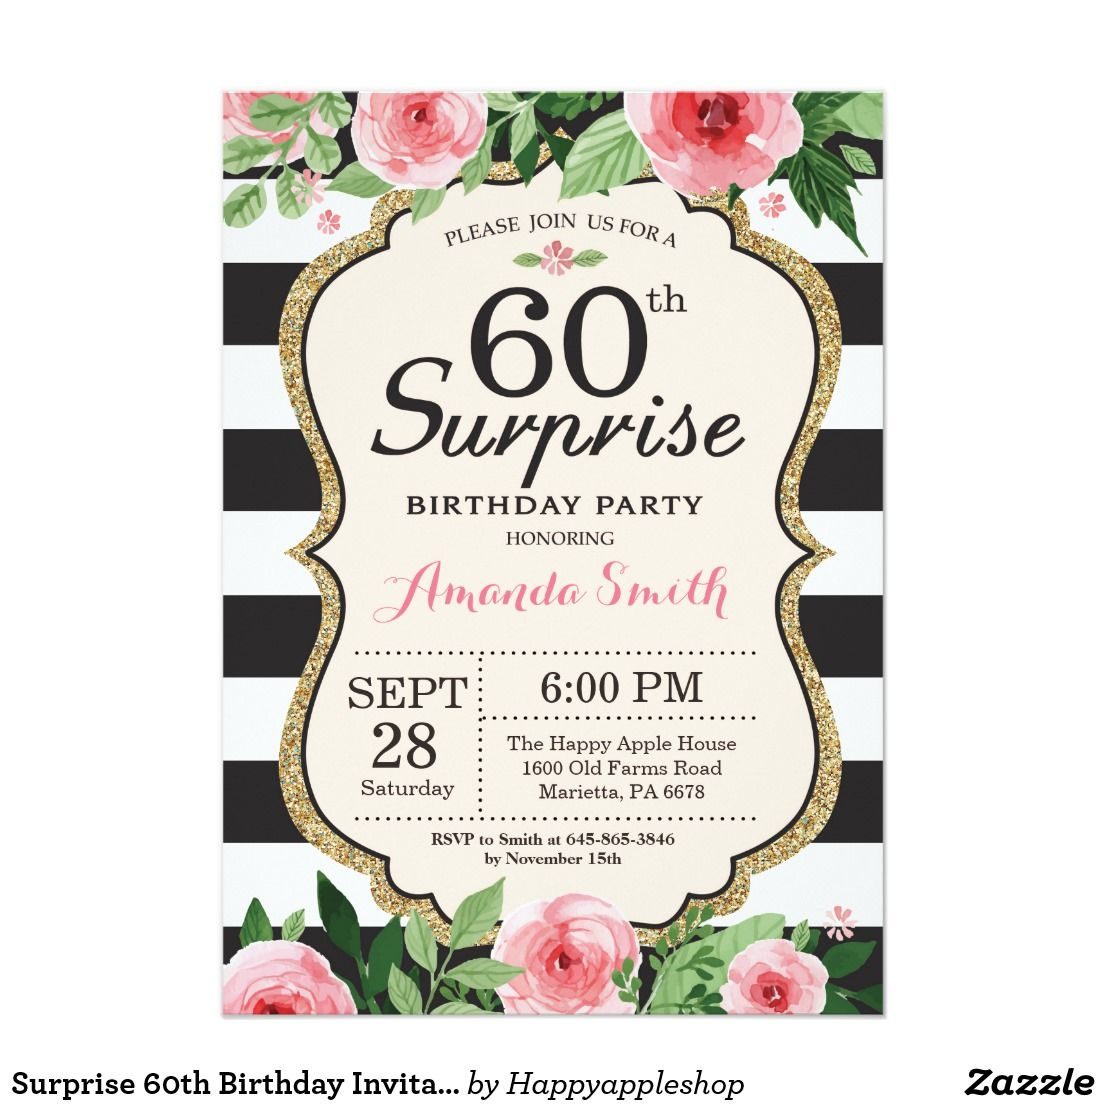 60th Birthday Invitation 60th Birthday Party Invitation 60th Etsy In 2021 60th Birthday Party Invitations 60th Birthday Invitations Party Invite Template